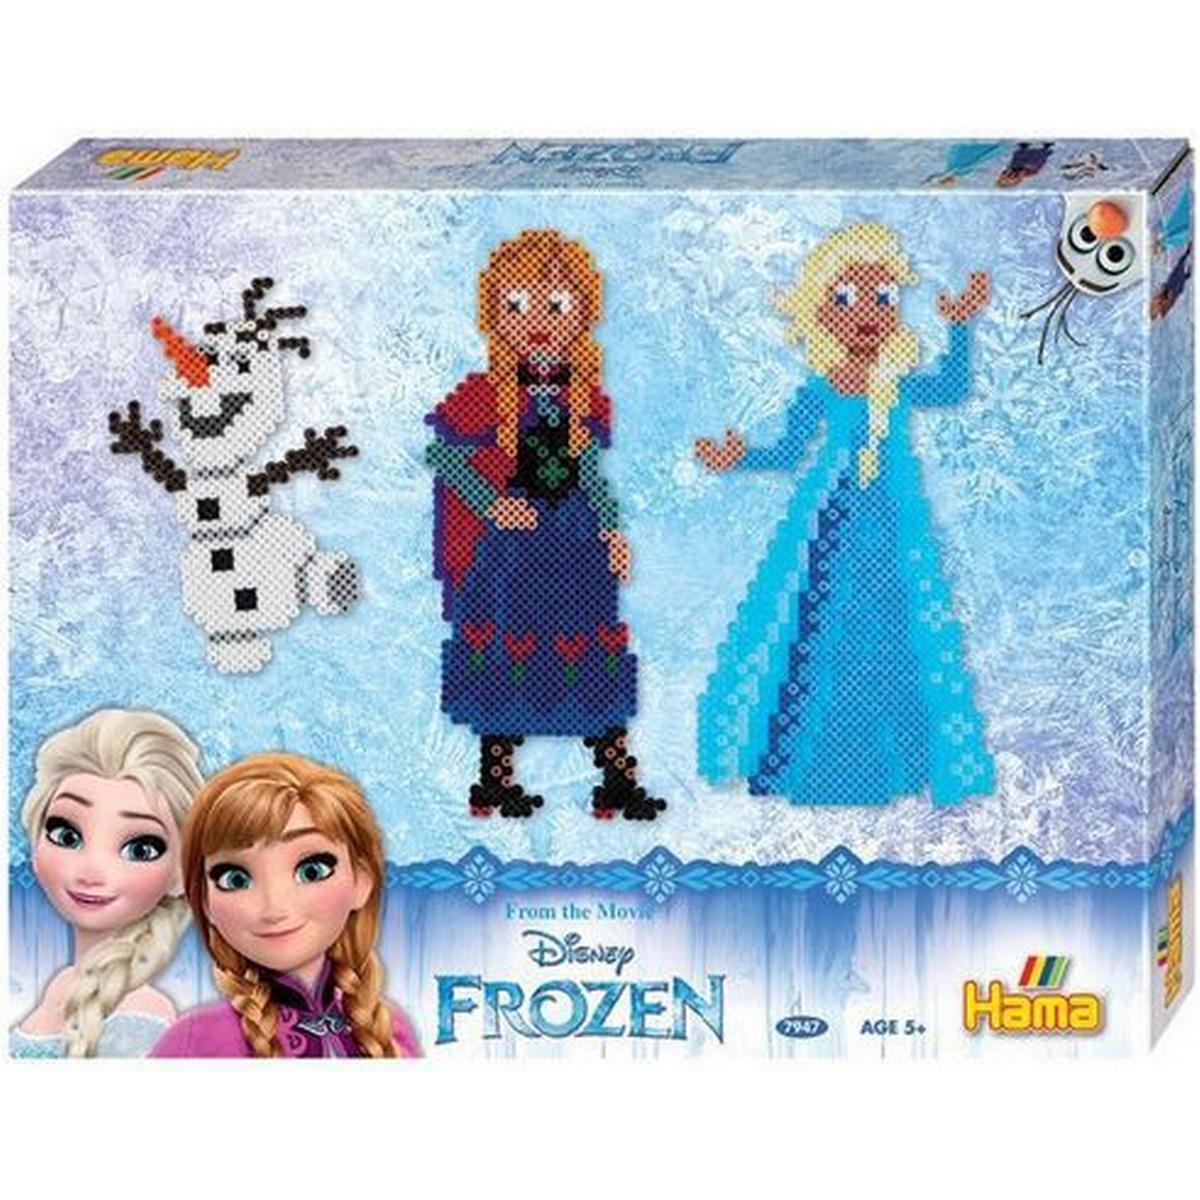 512a25ee626d Frost - Kreativitet & Pyssel - Jämför priser på Frozen PriceRunner